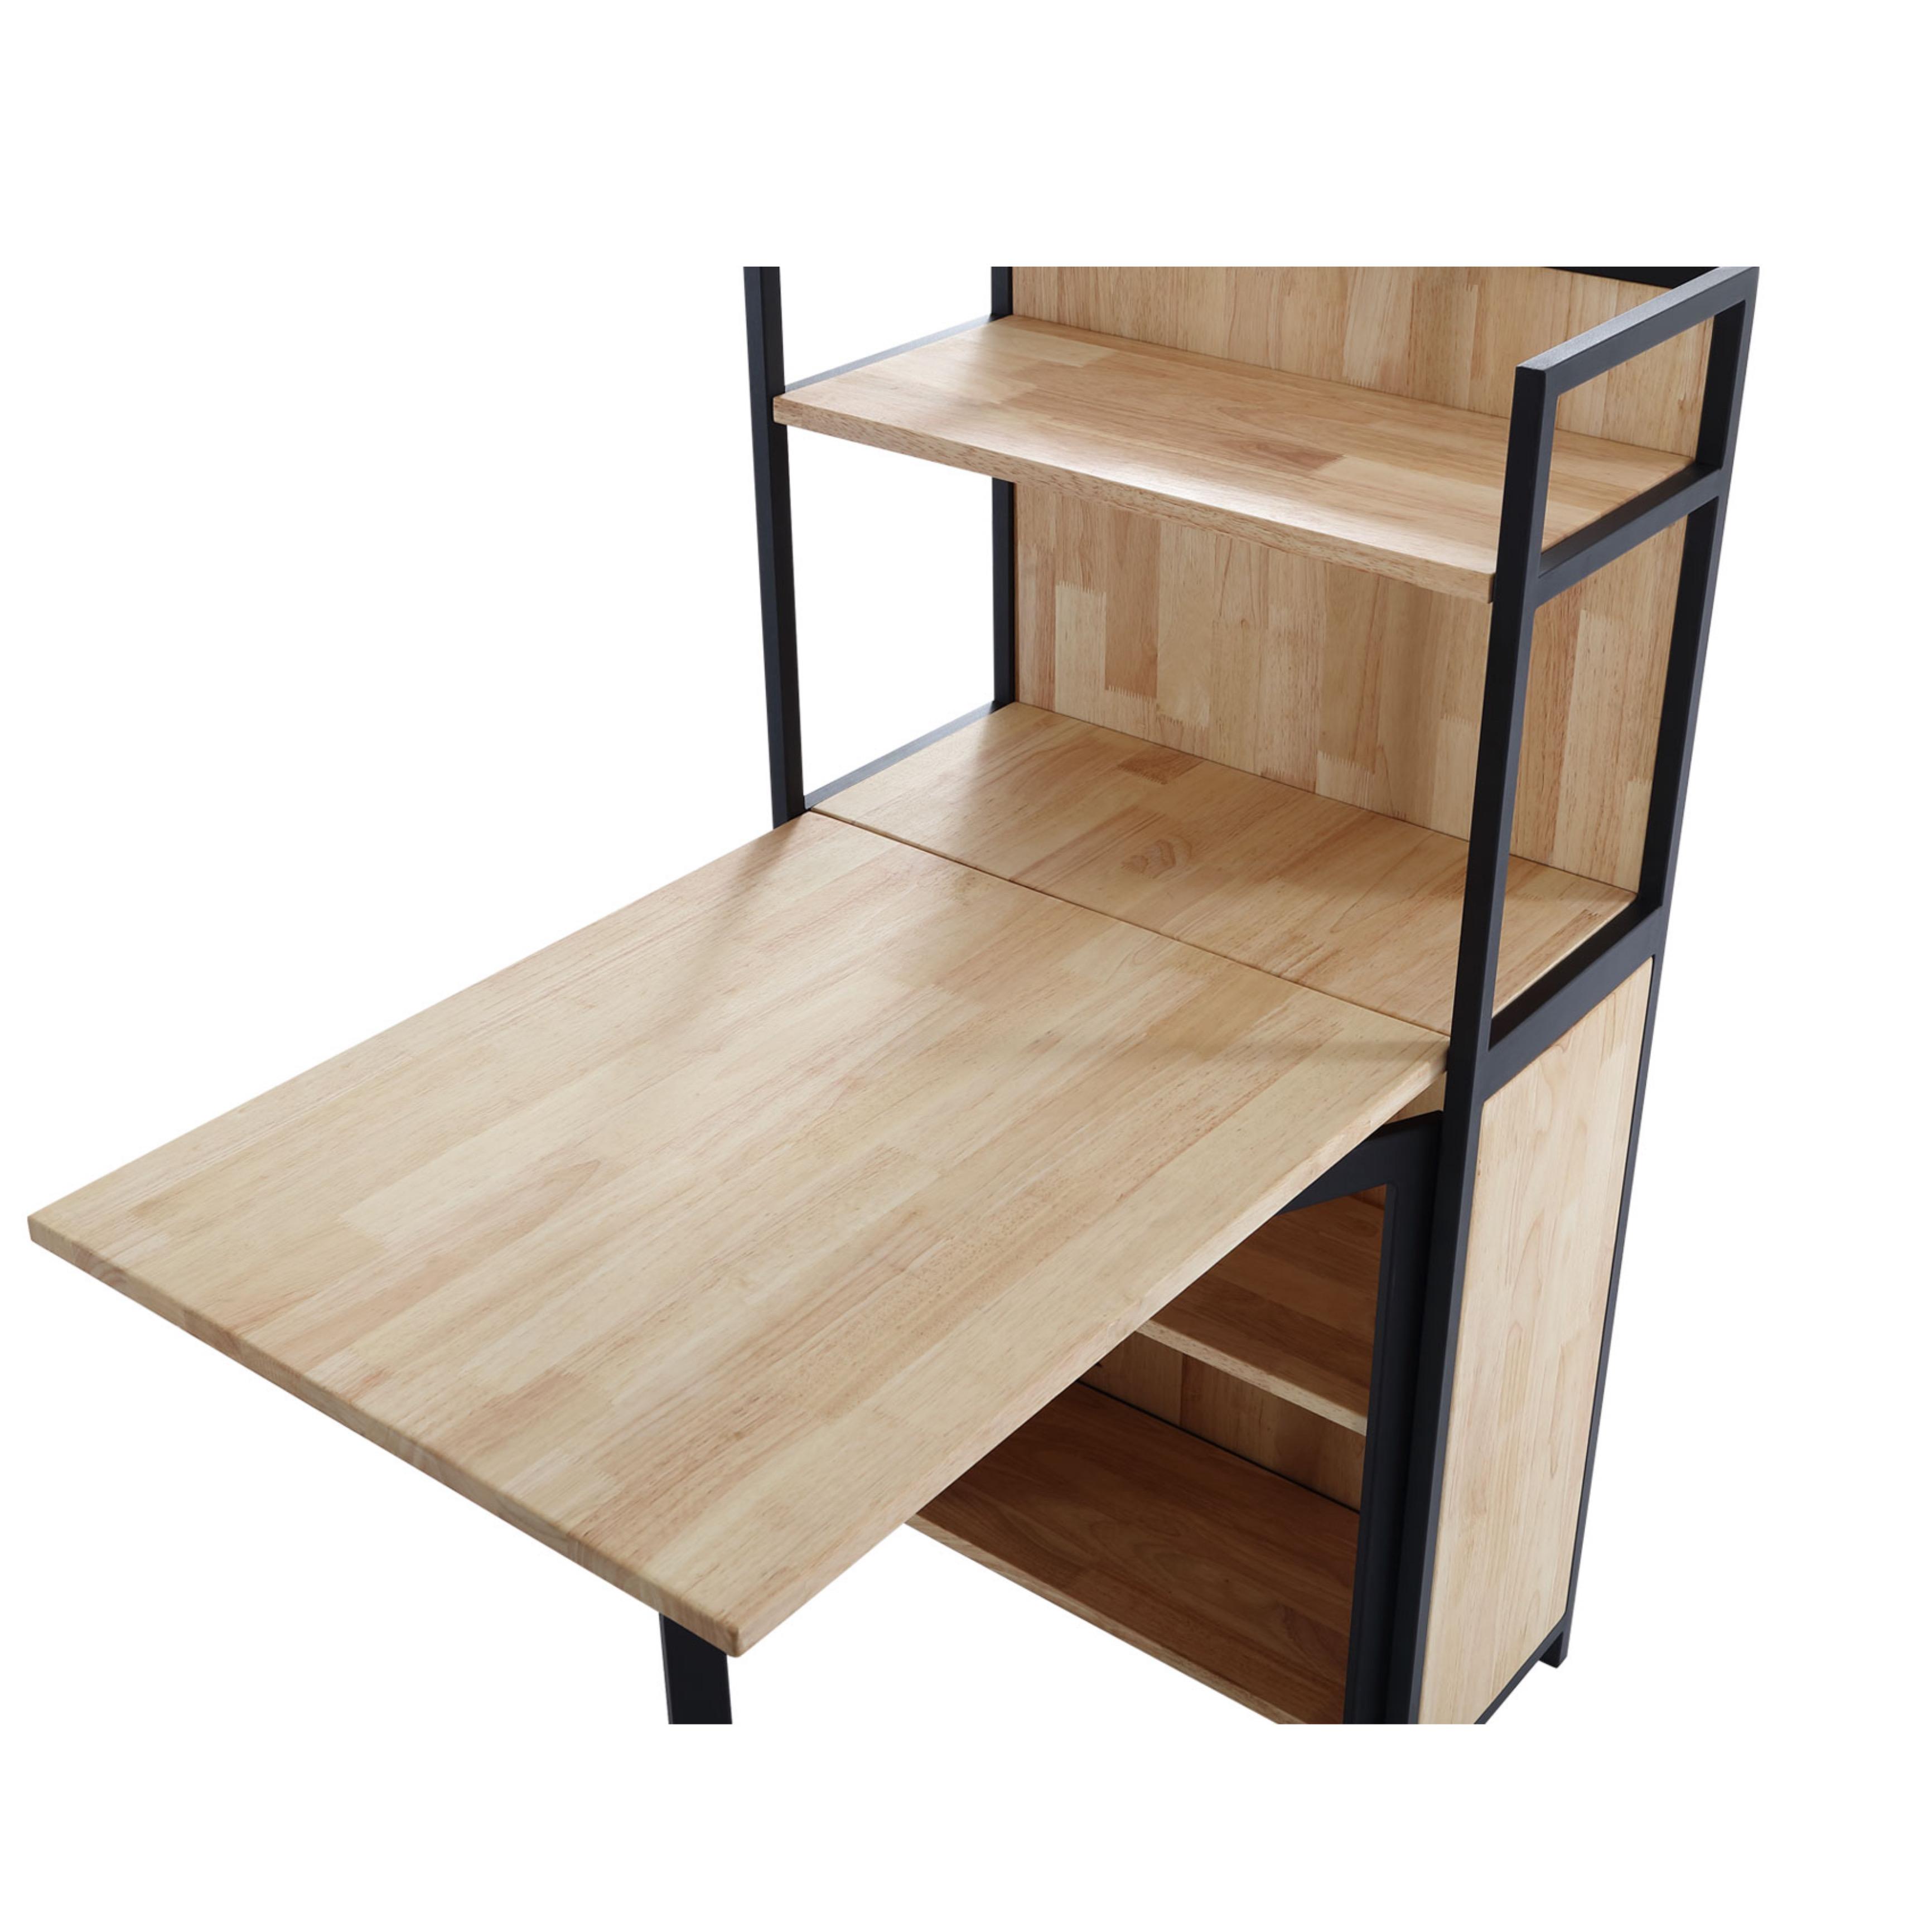 29595-estanteria-con-mesa-plegable-roble-2.jpeg